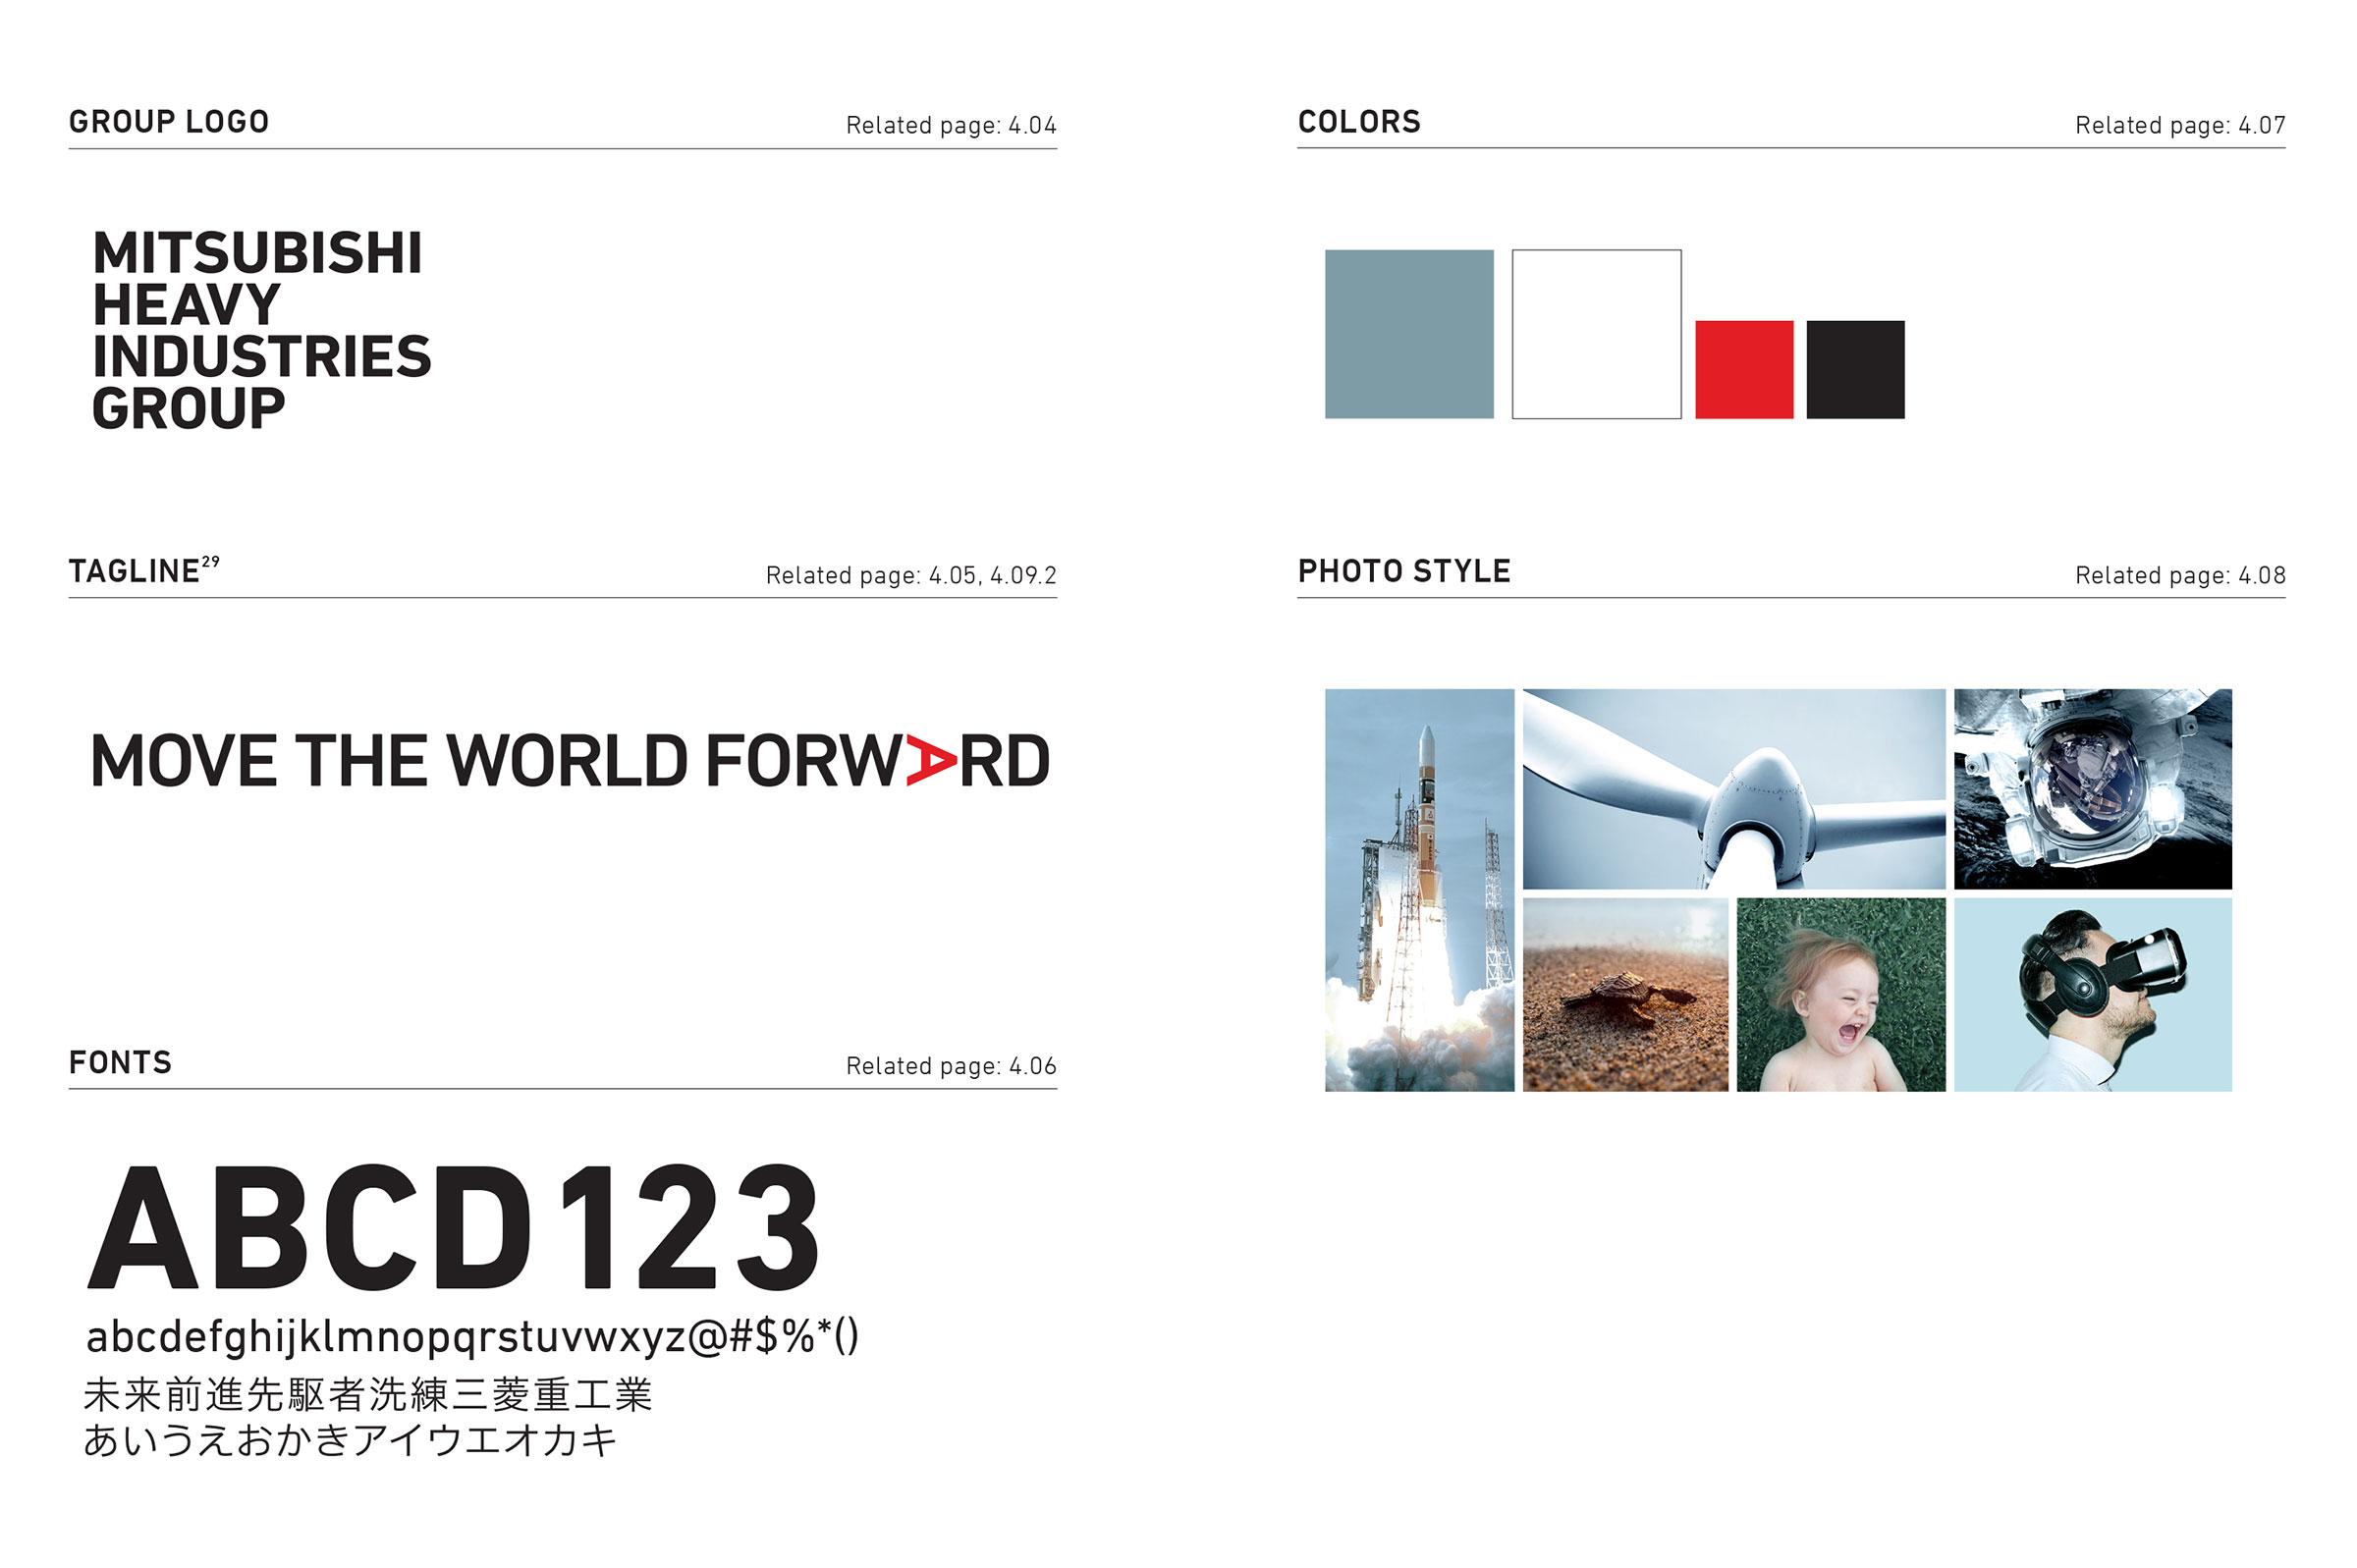 Mitsubishi Group brand design visuals